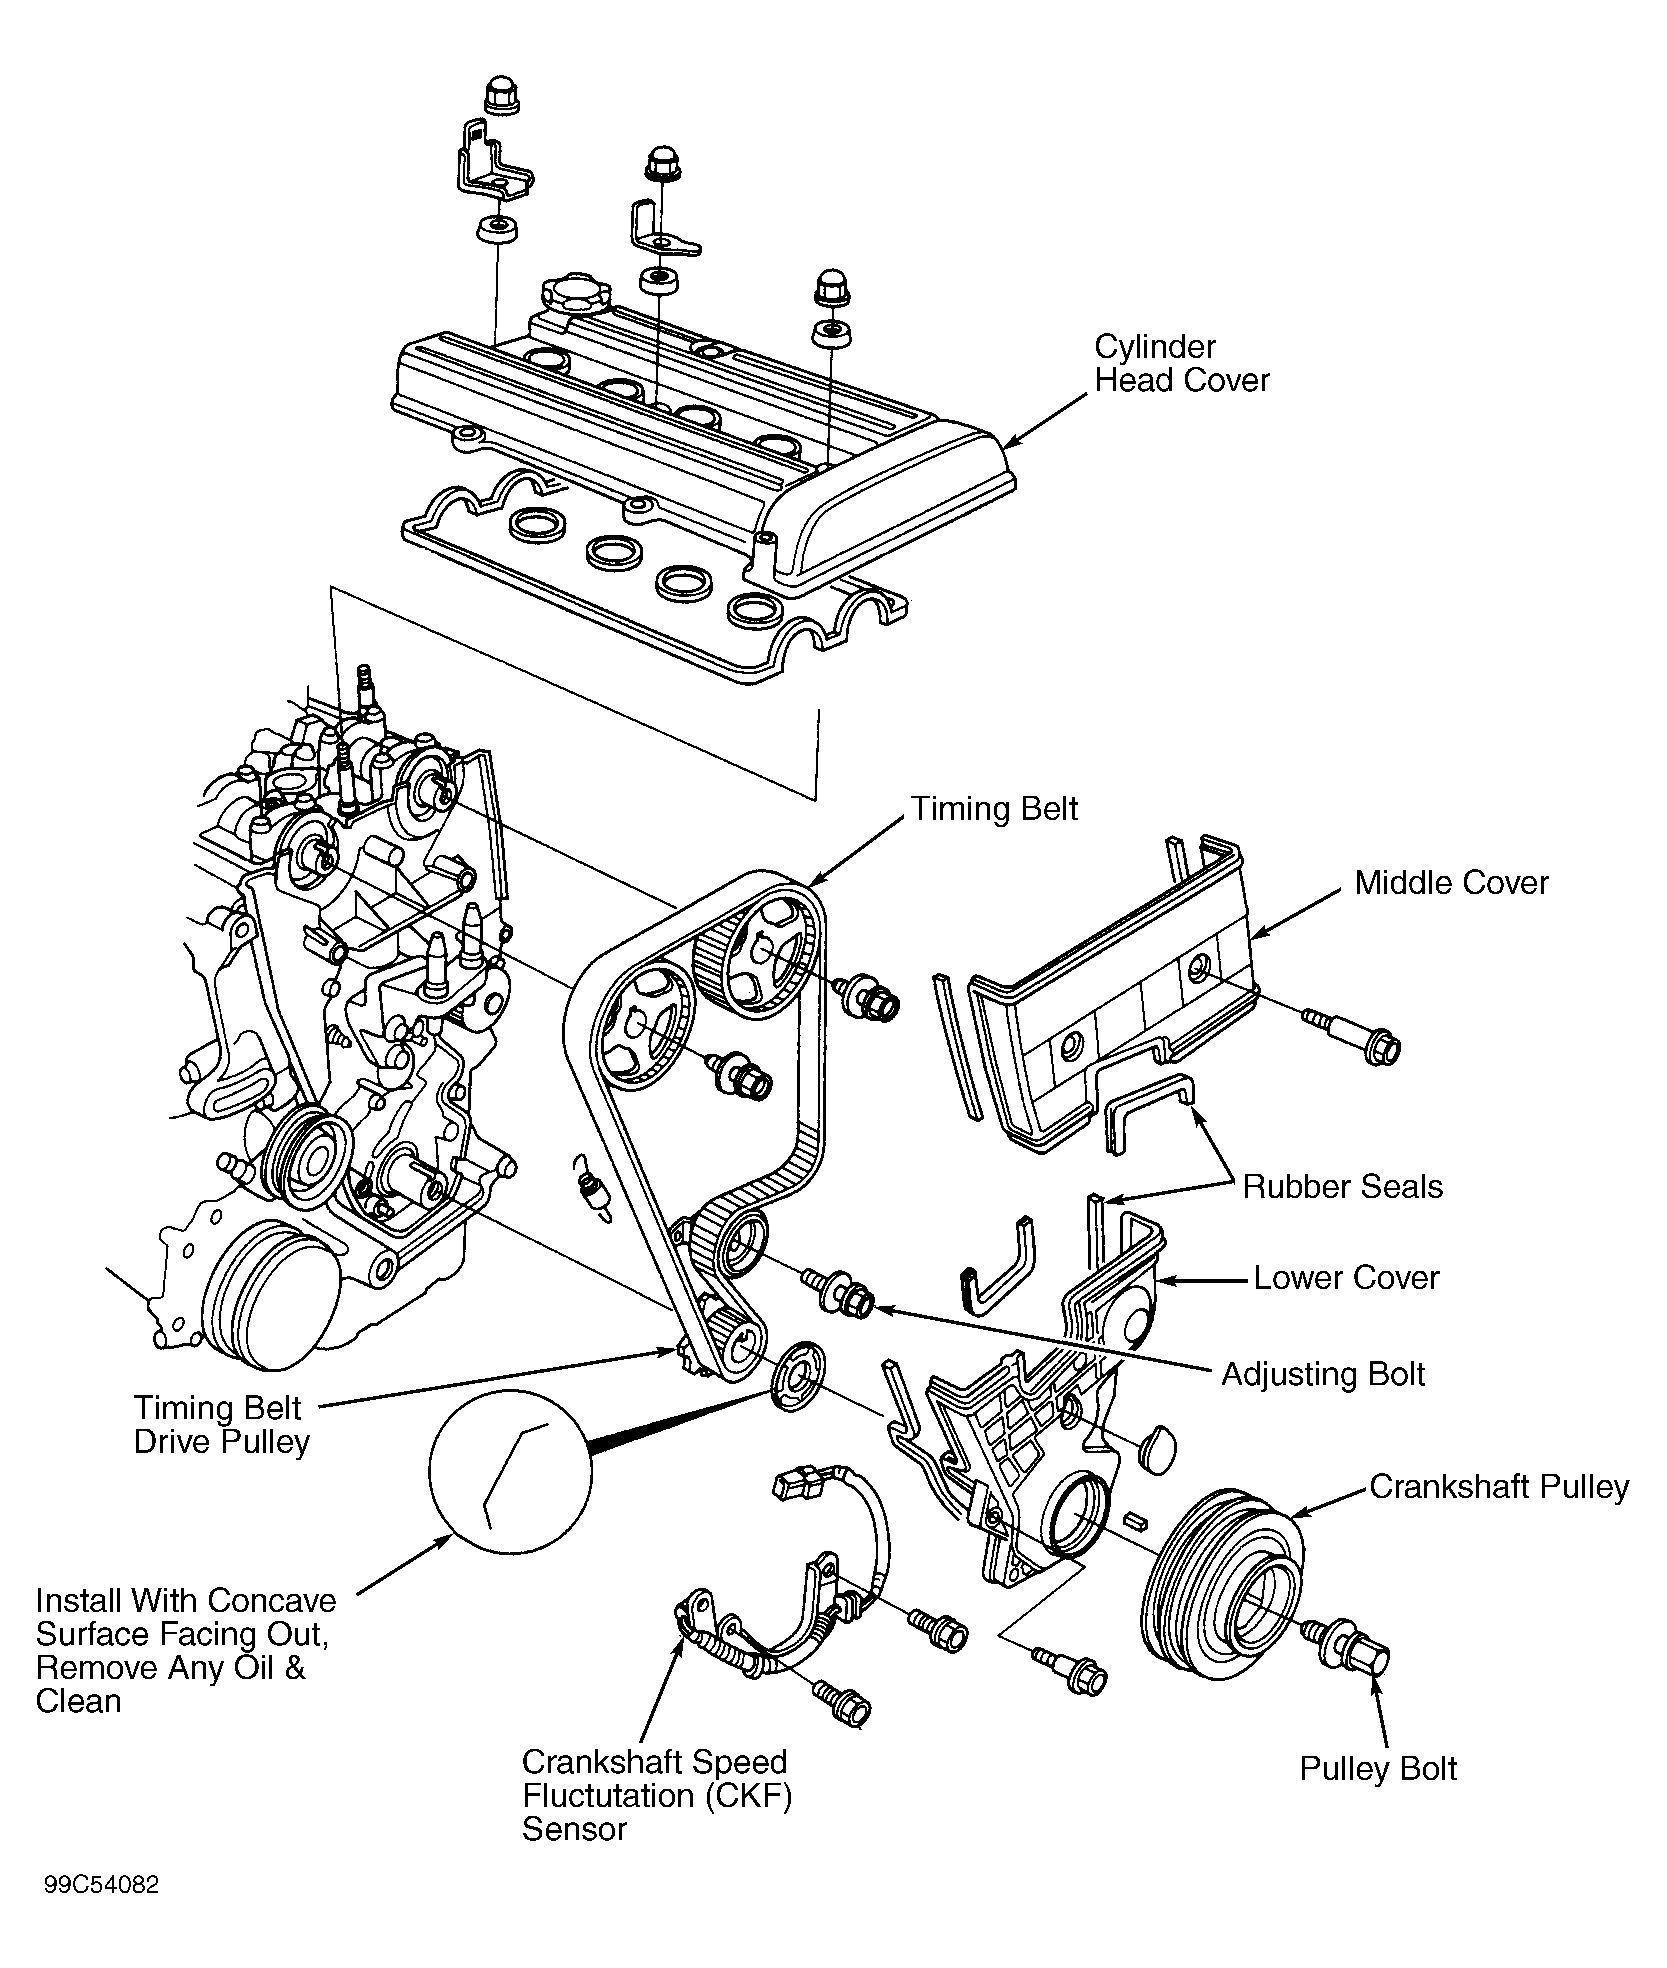 Honda Crv Engine Diagram Wiring Diagram 2003 Ford Excursion Engine Diagram 2003 Honda Crv Engine Diagram 4 Best Cheap Hotels Honda Crv Ford Excursion Diagram